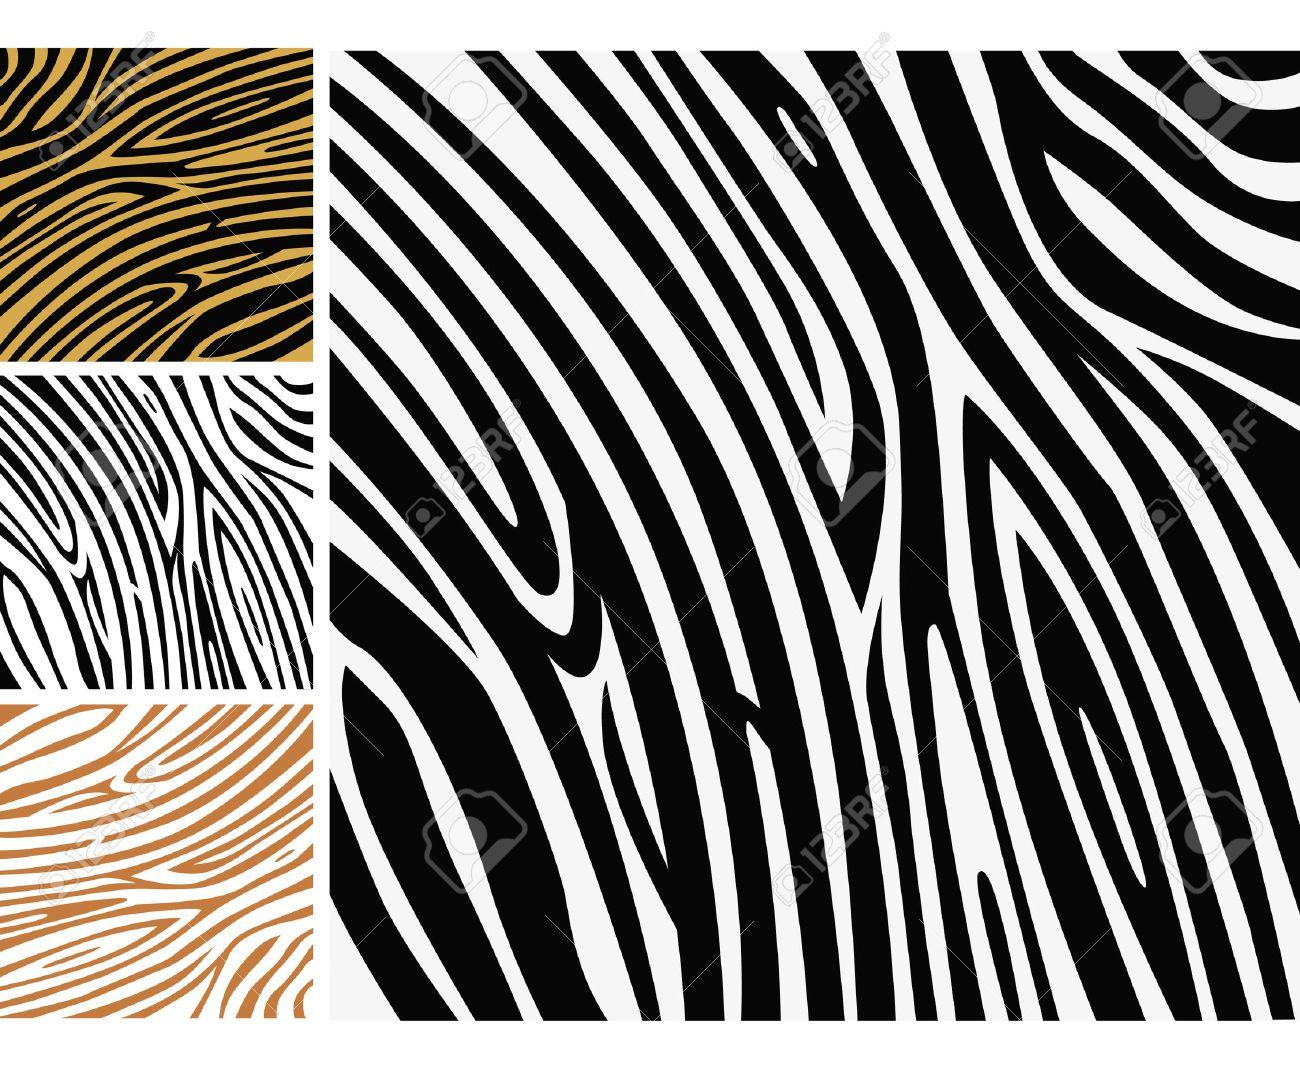 Animal background pattern - zebra skin print. Background texture of zebra skin. Use this zebra print for your unique design! - 6642941